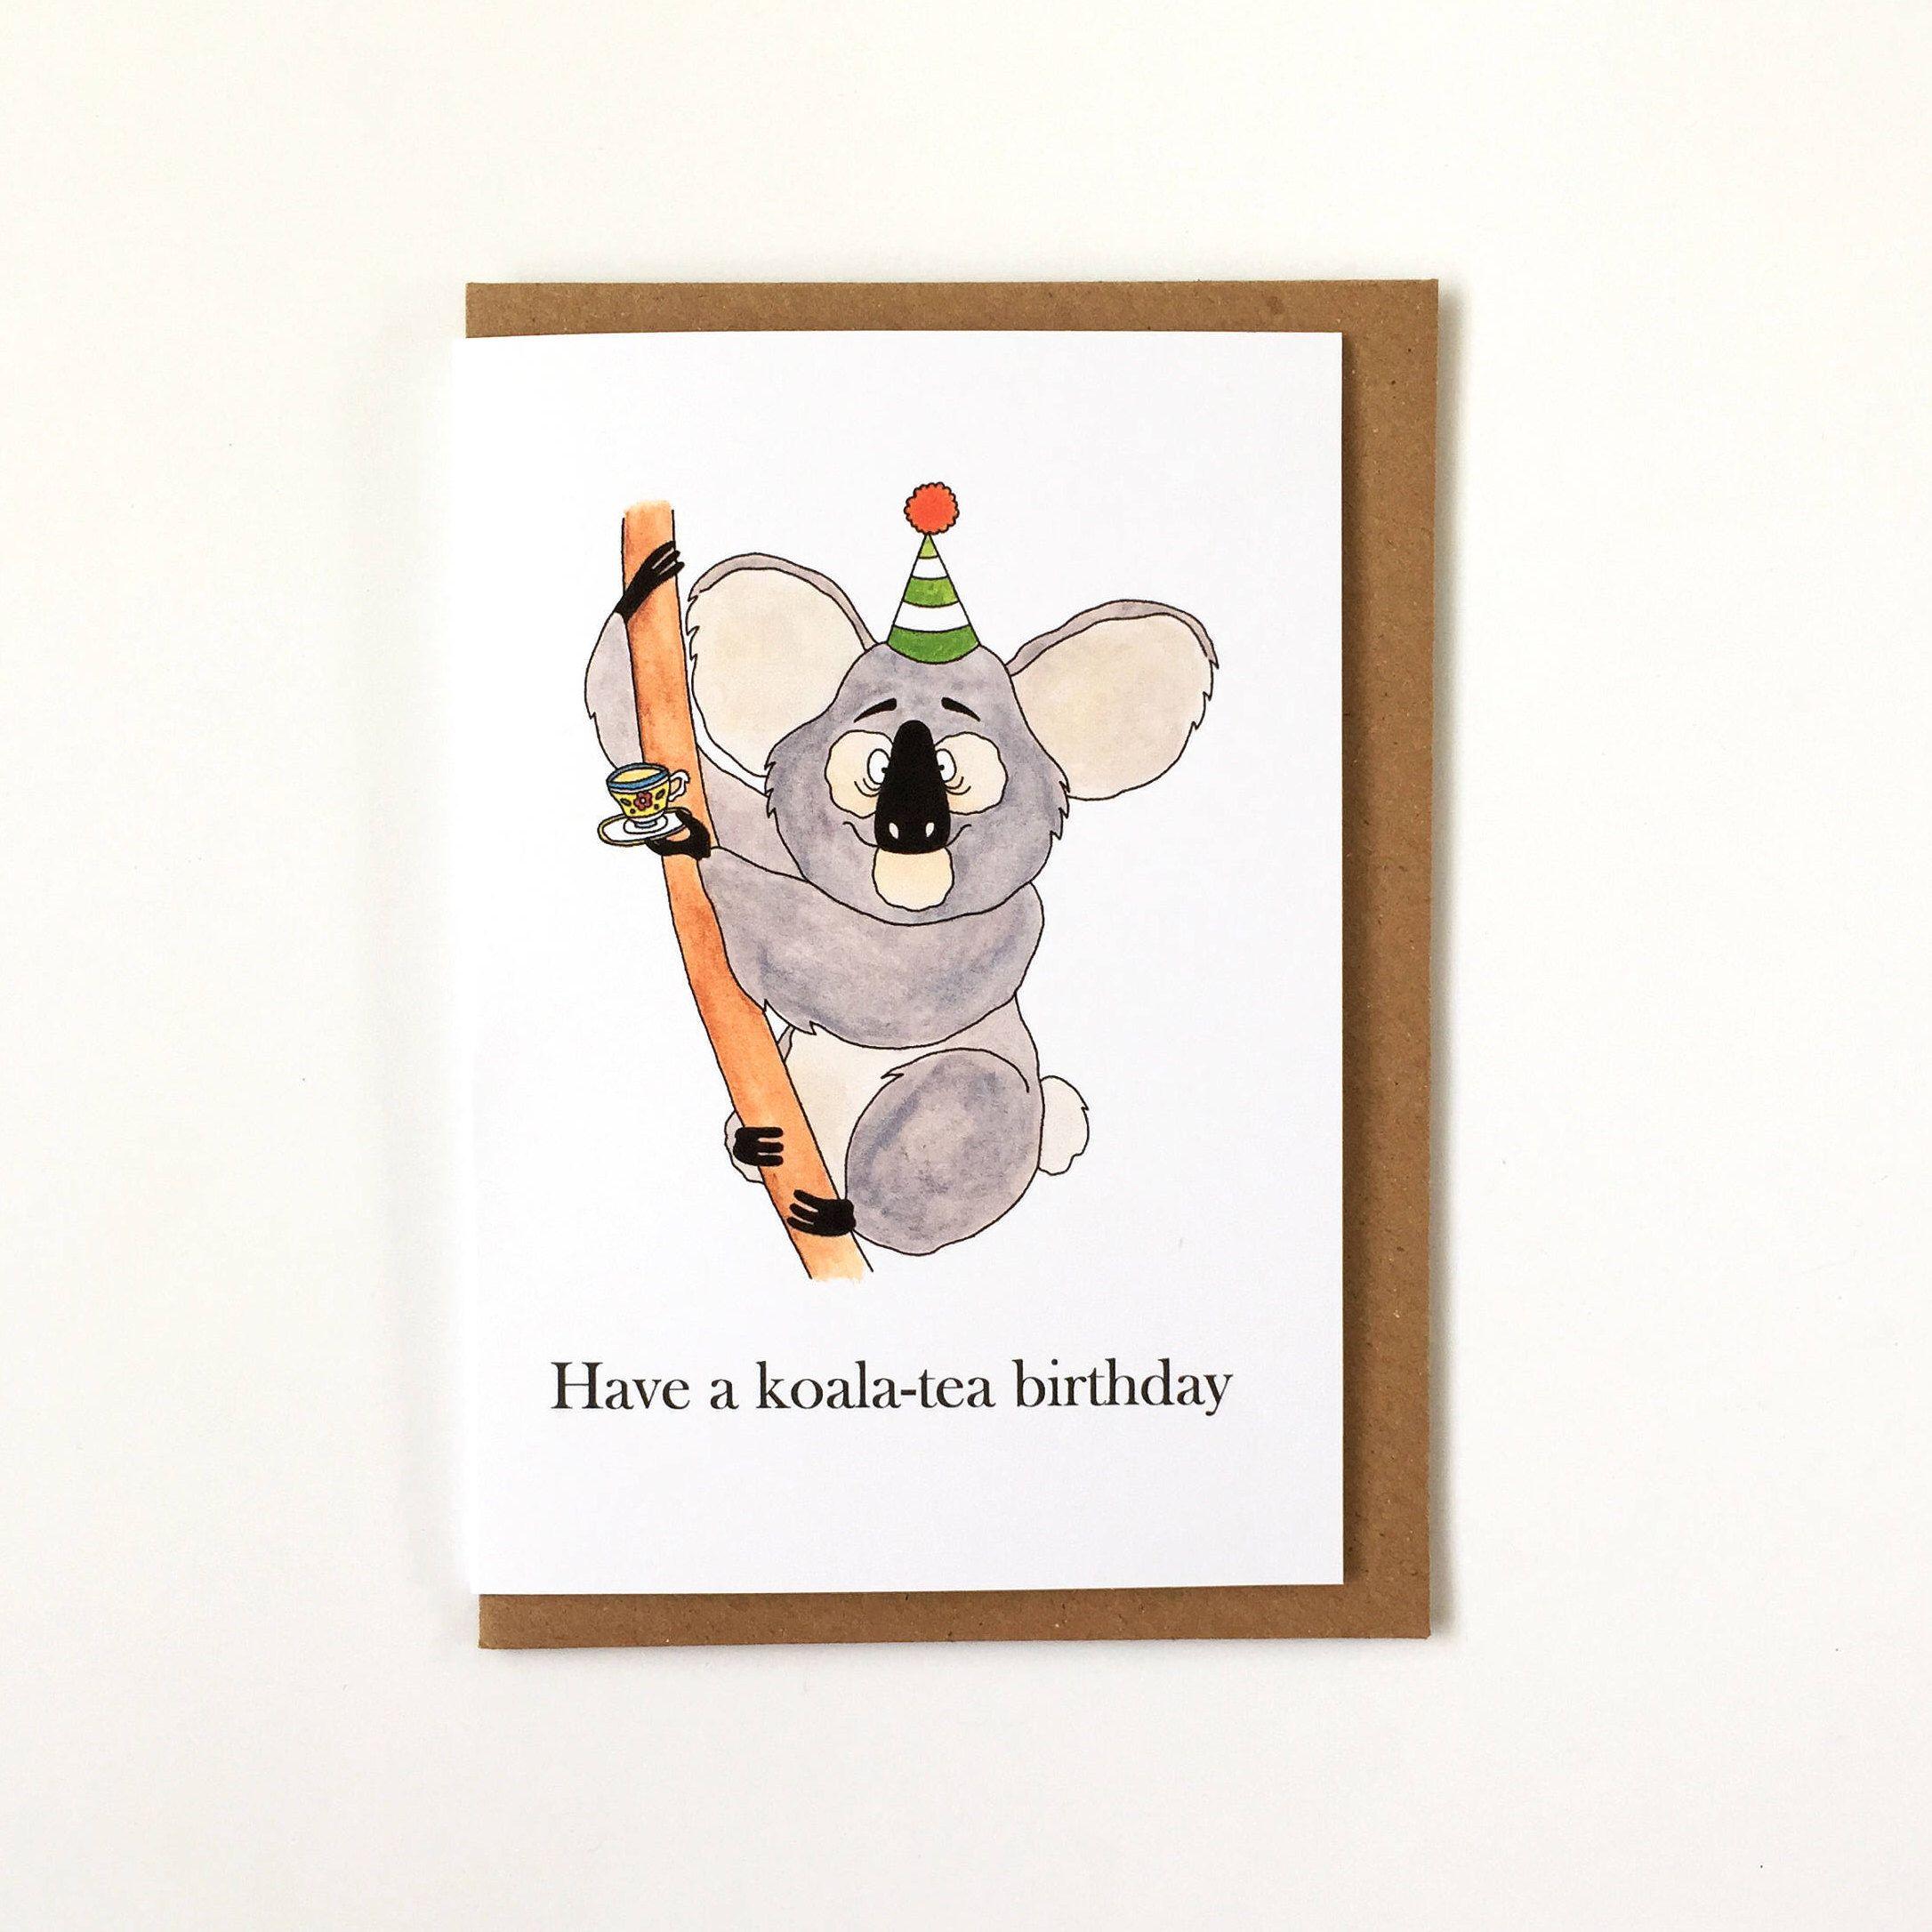 Have A Koala Tea Birthday Pun Humour Card Happy Birthday Etsy Happy Birthday Greetings Card Koala Tea Birthday Puns